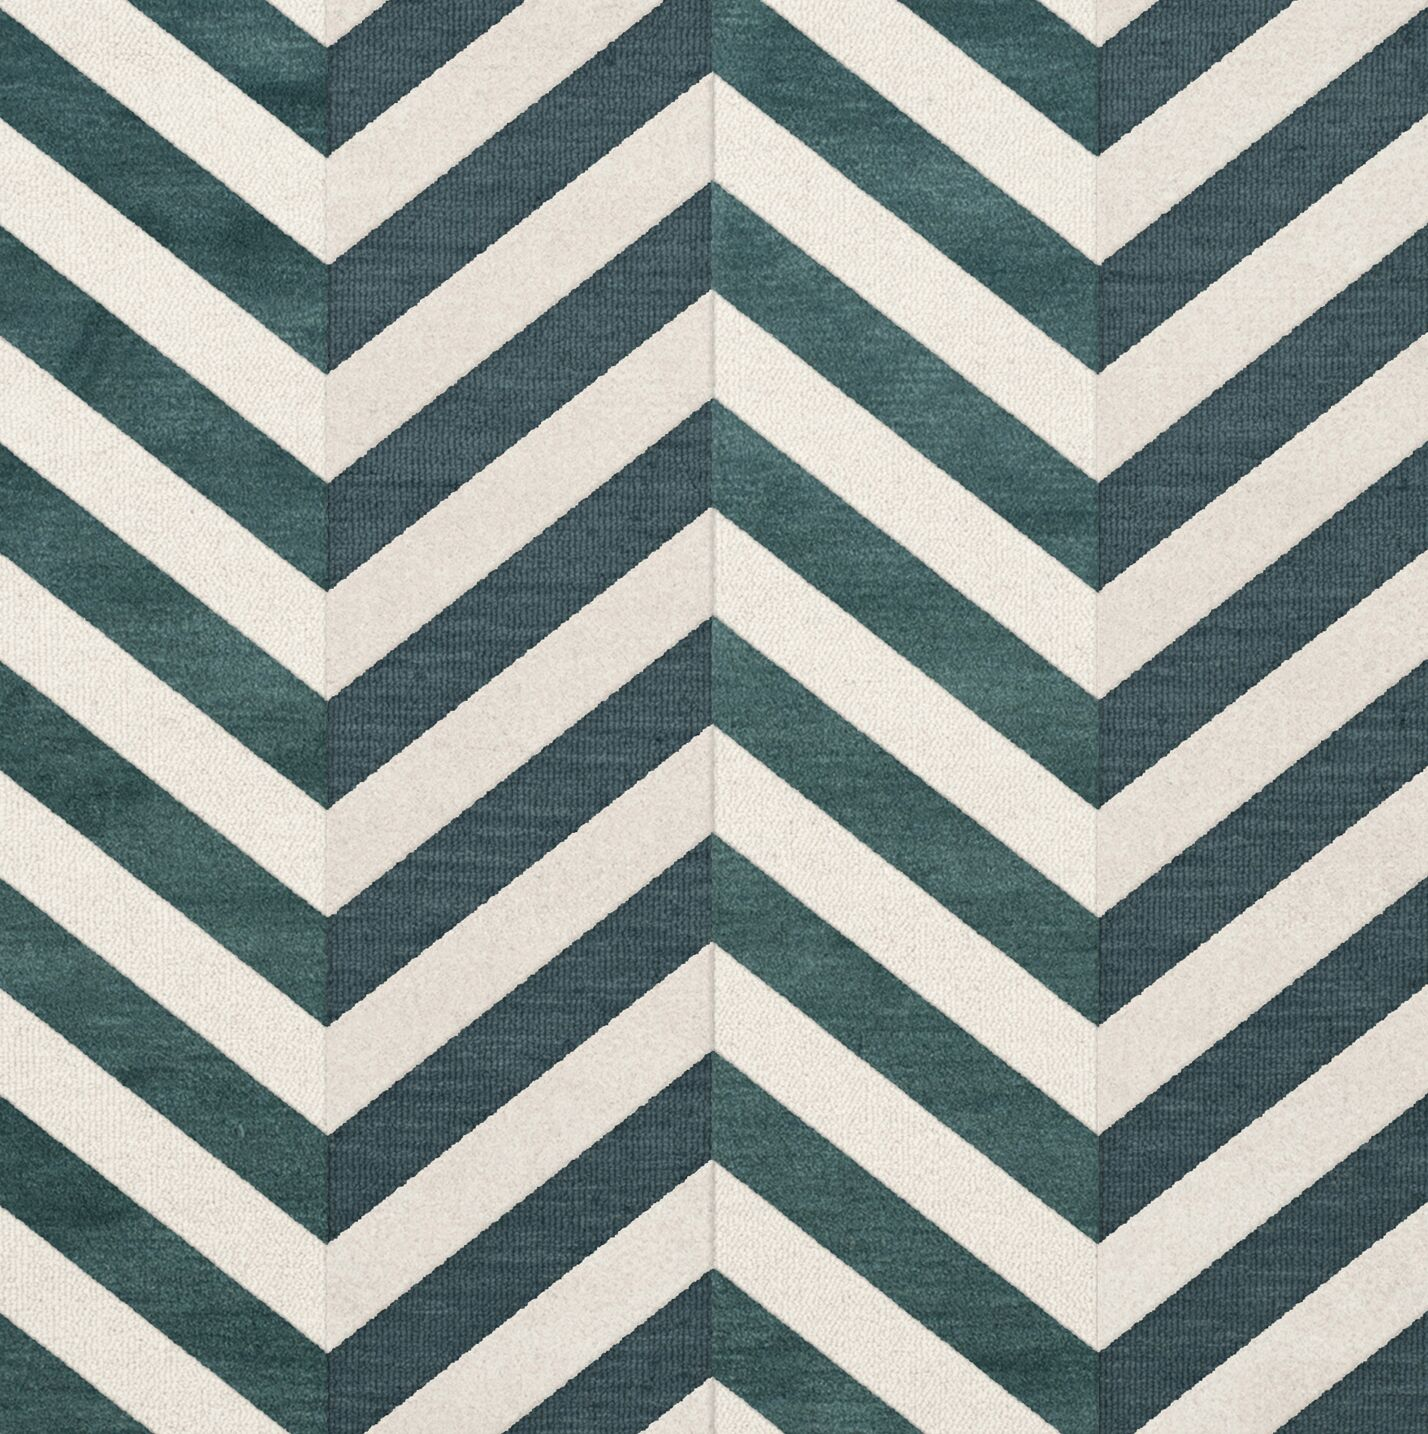 Stidham Wool Baltic Area Rug Rug Size: Square 6'